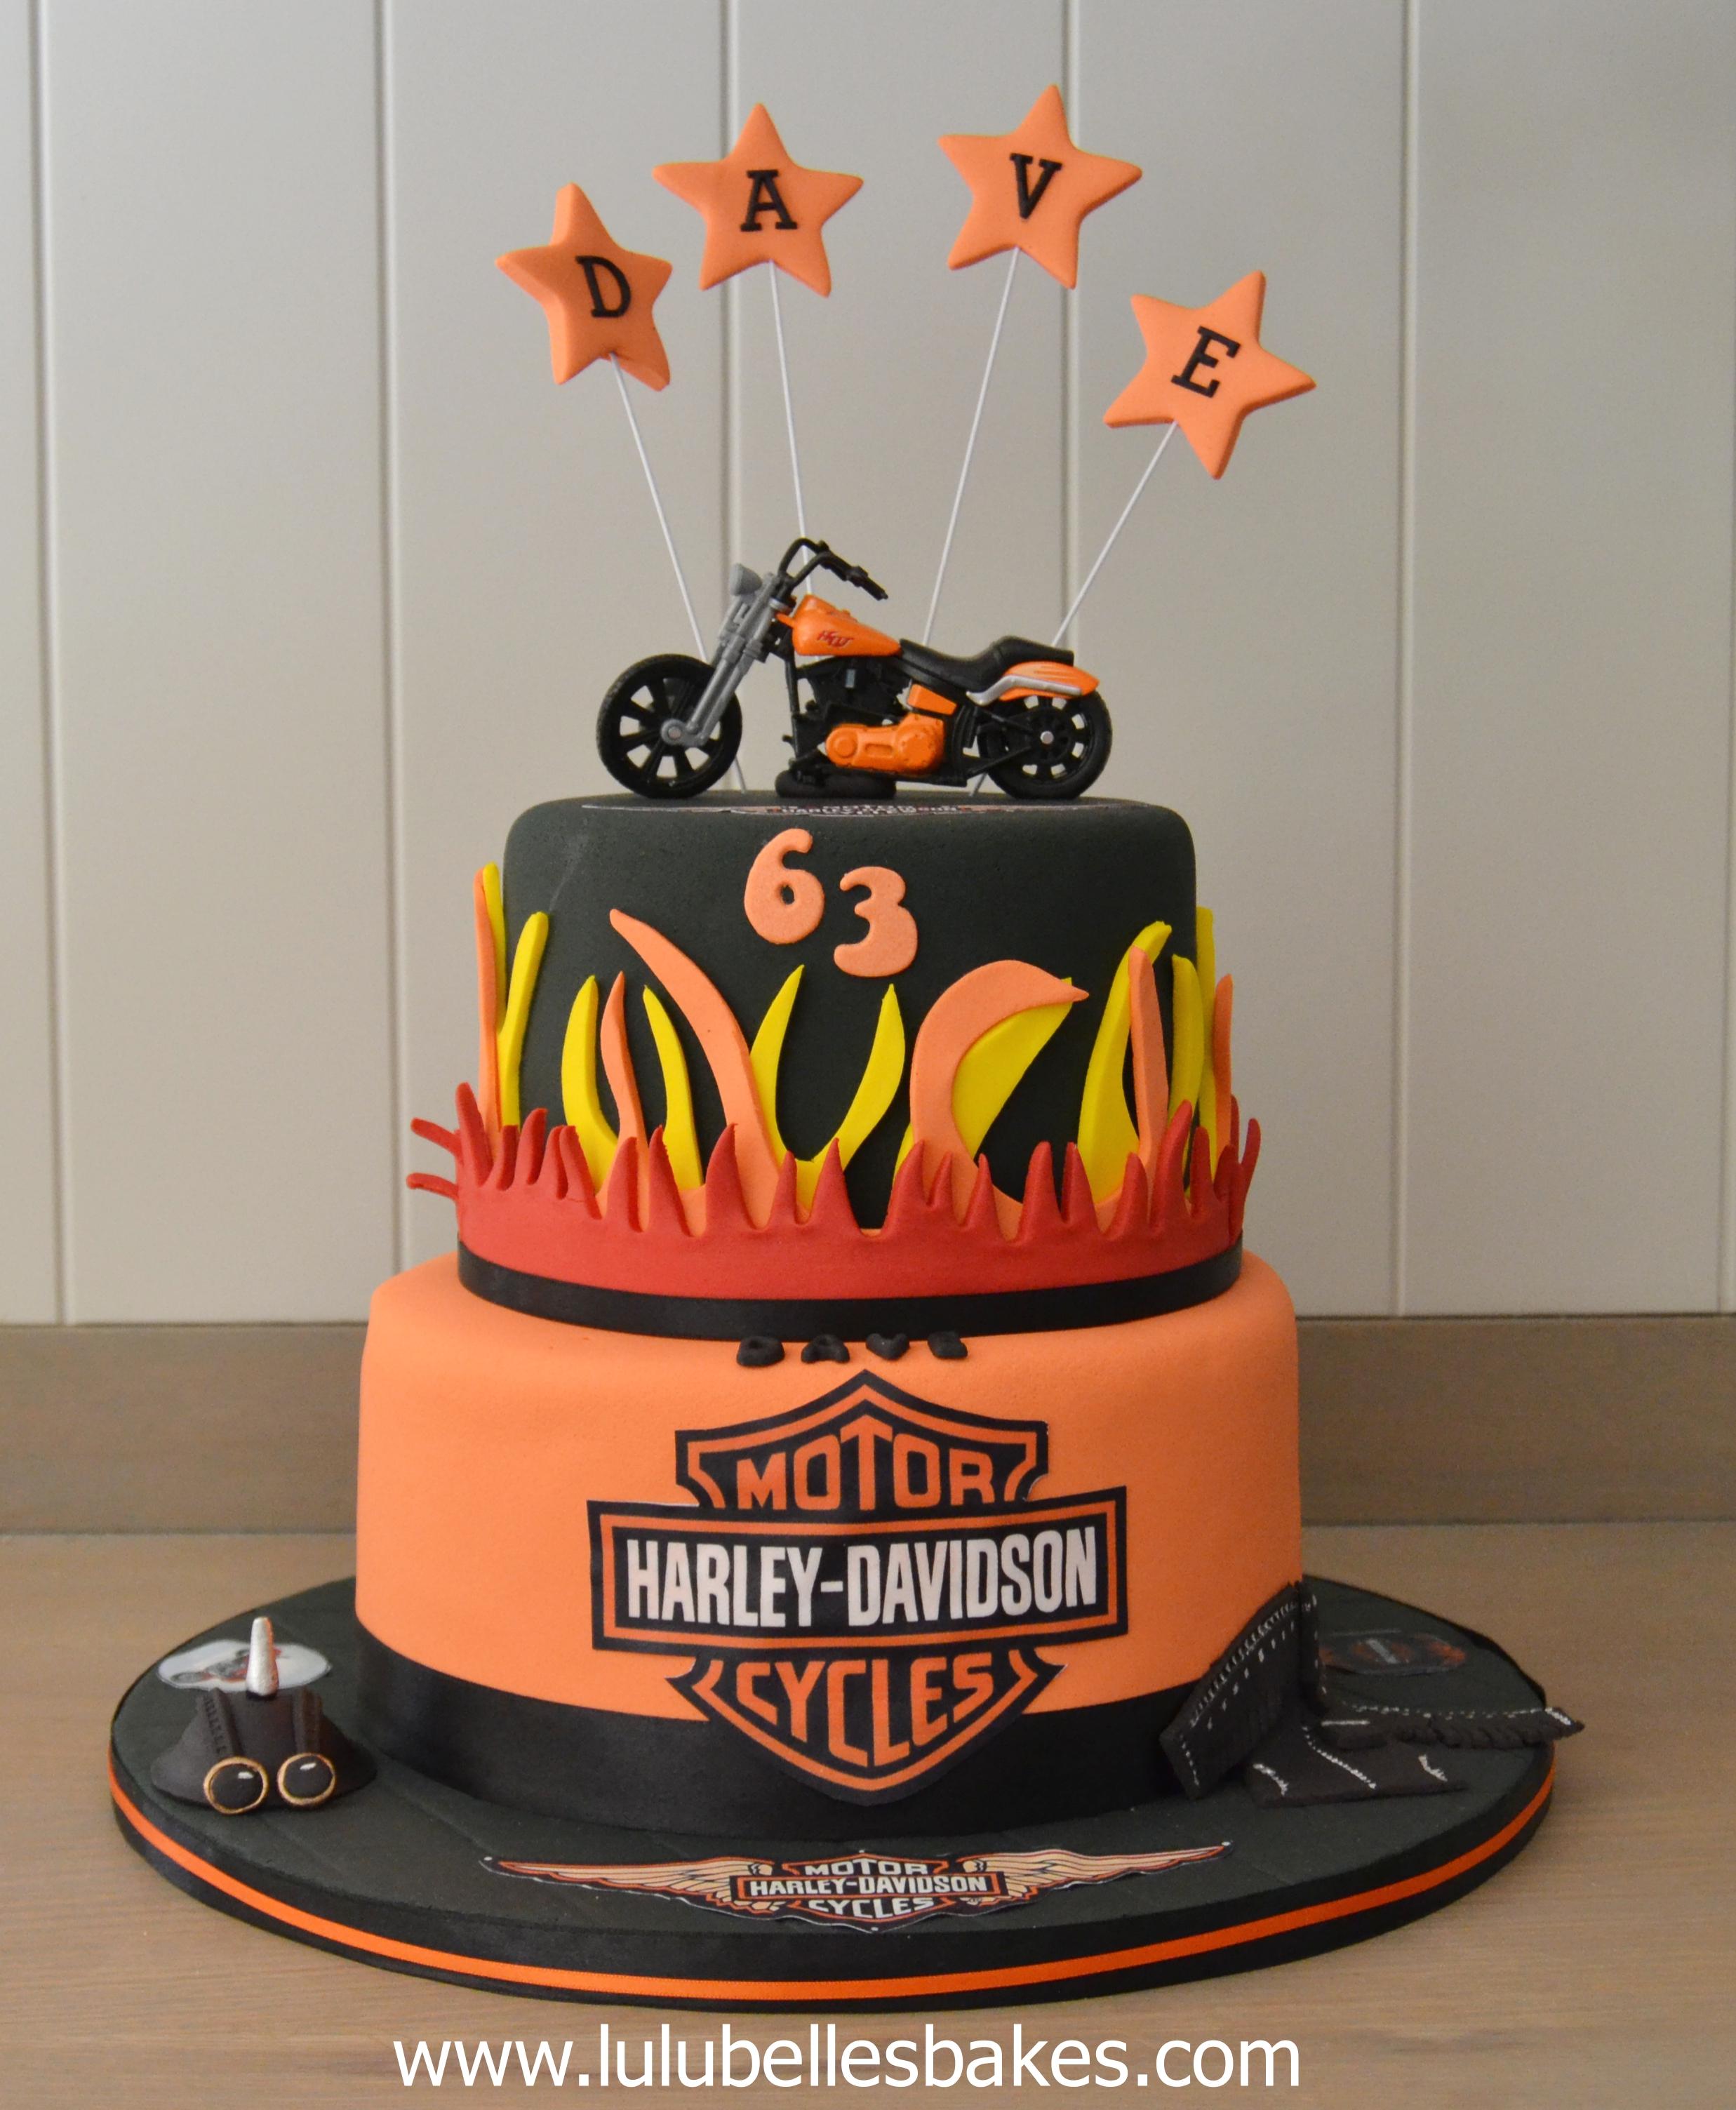 Harley Davidson Cake Decorations Showing Post Media For Harley Davidson Birthday Cake Cartoon